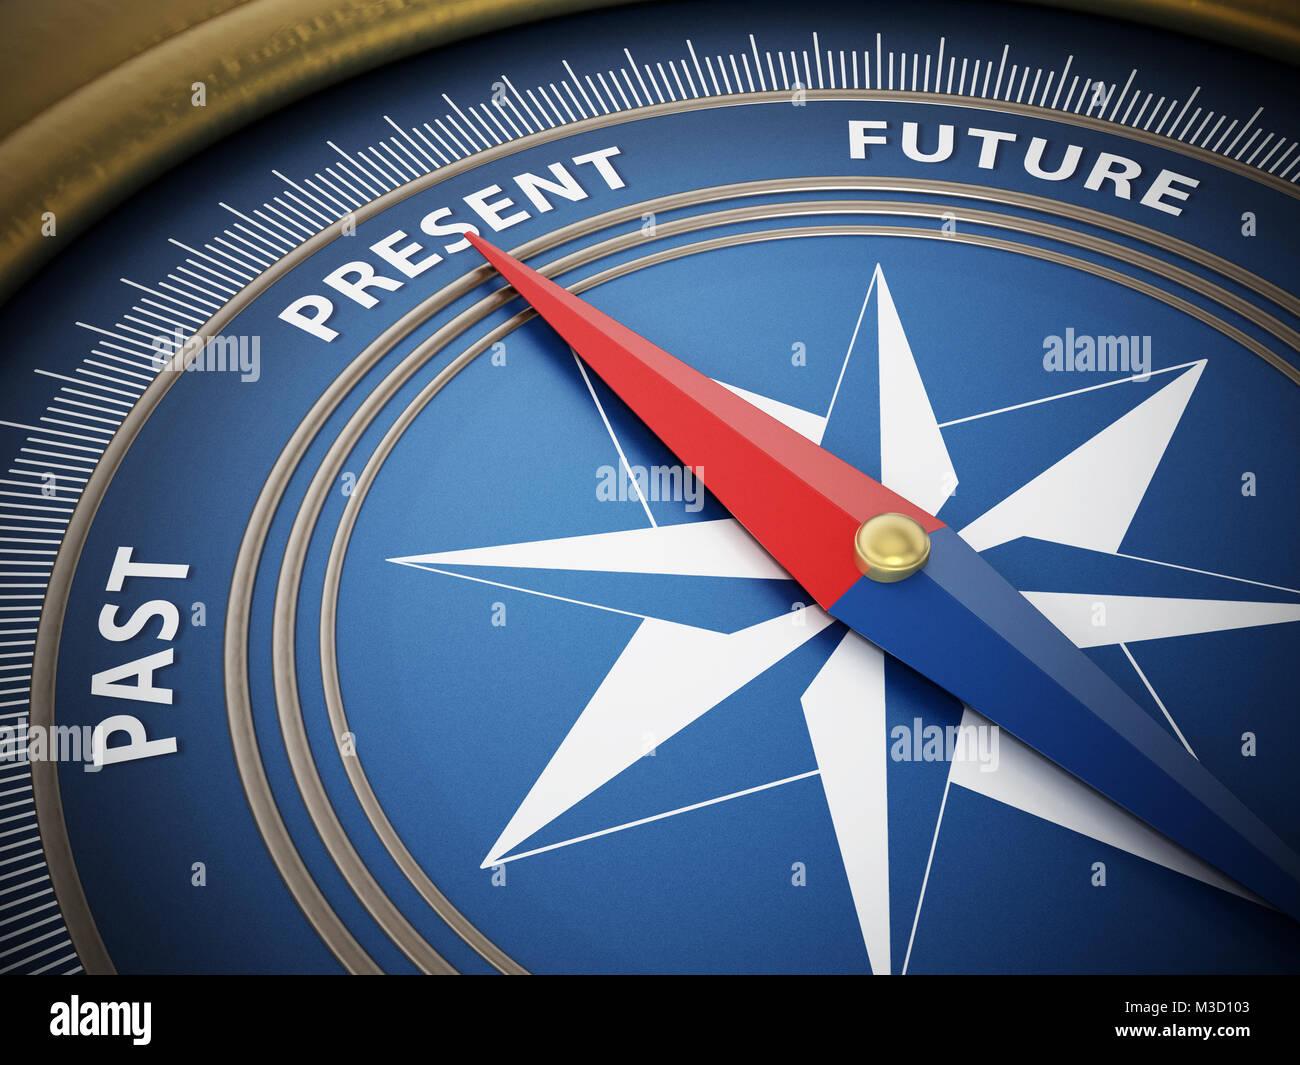 Present Future Stock Photos & Present Future Stock Images - Alamy